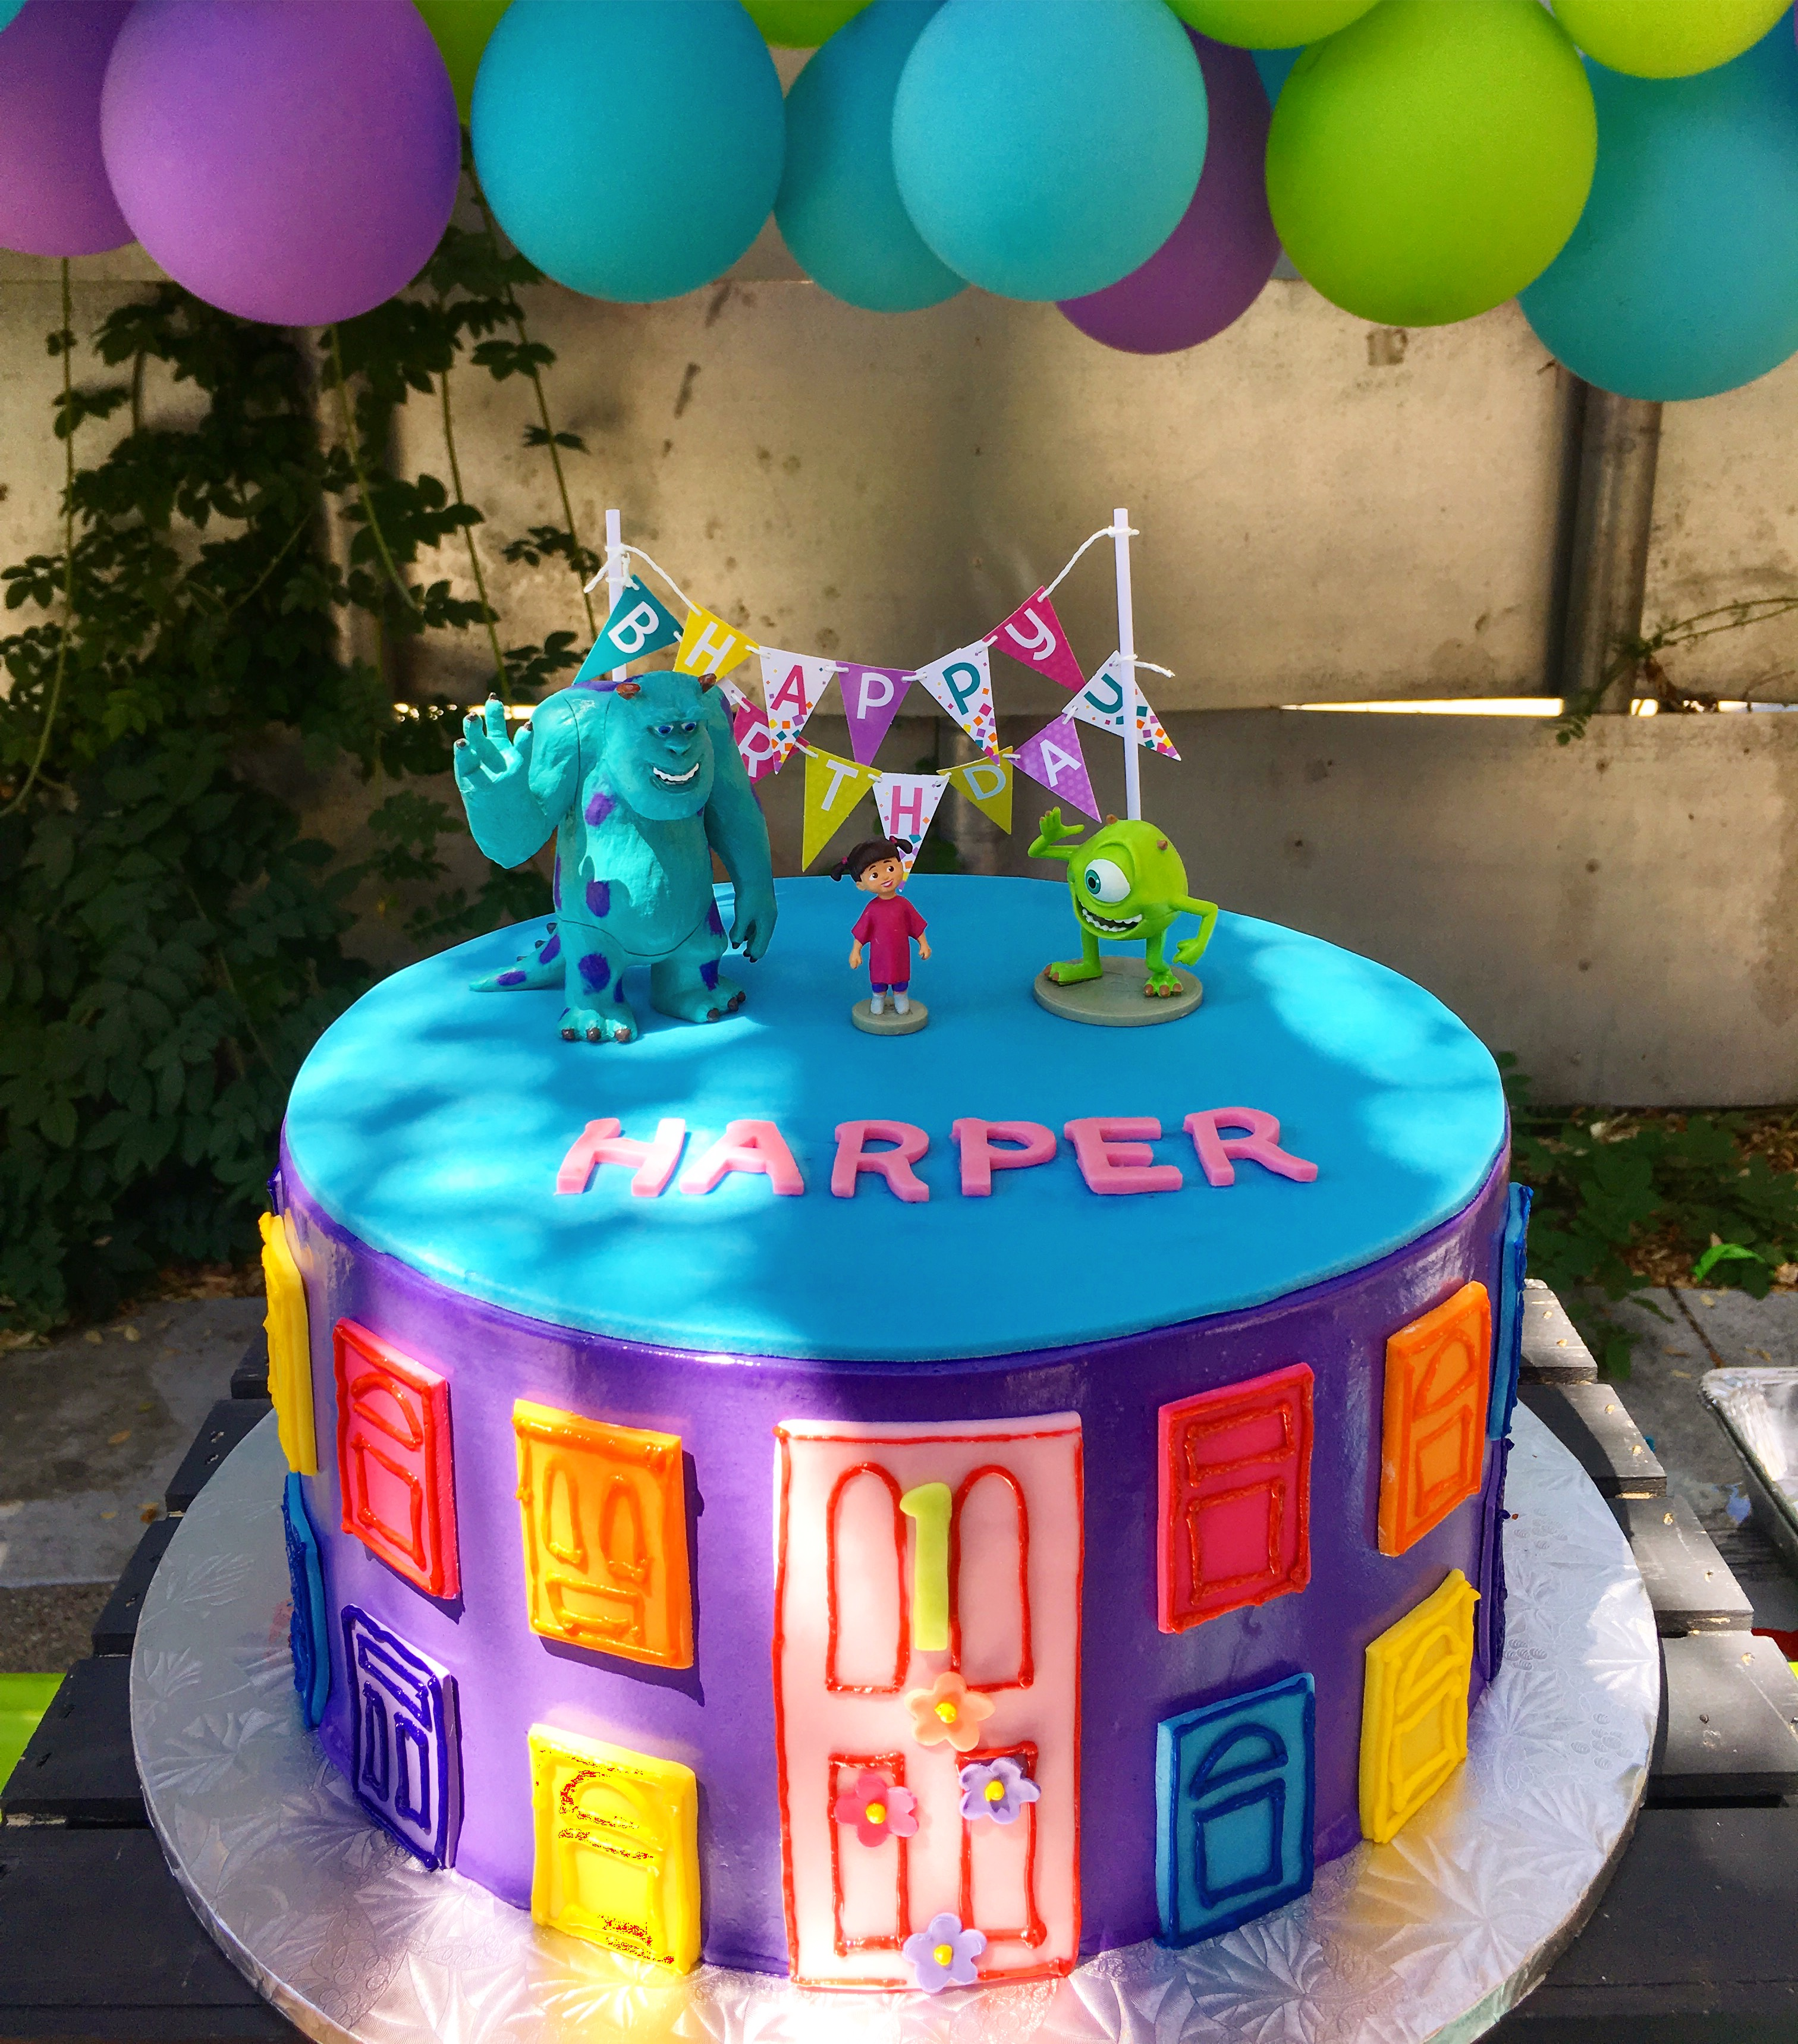 2978, first birthday, 1st birthday, monsters inc, pixar, mike, sully, blue, door, doors, purple